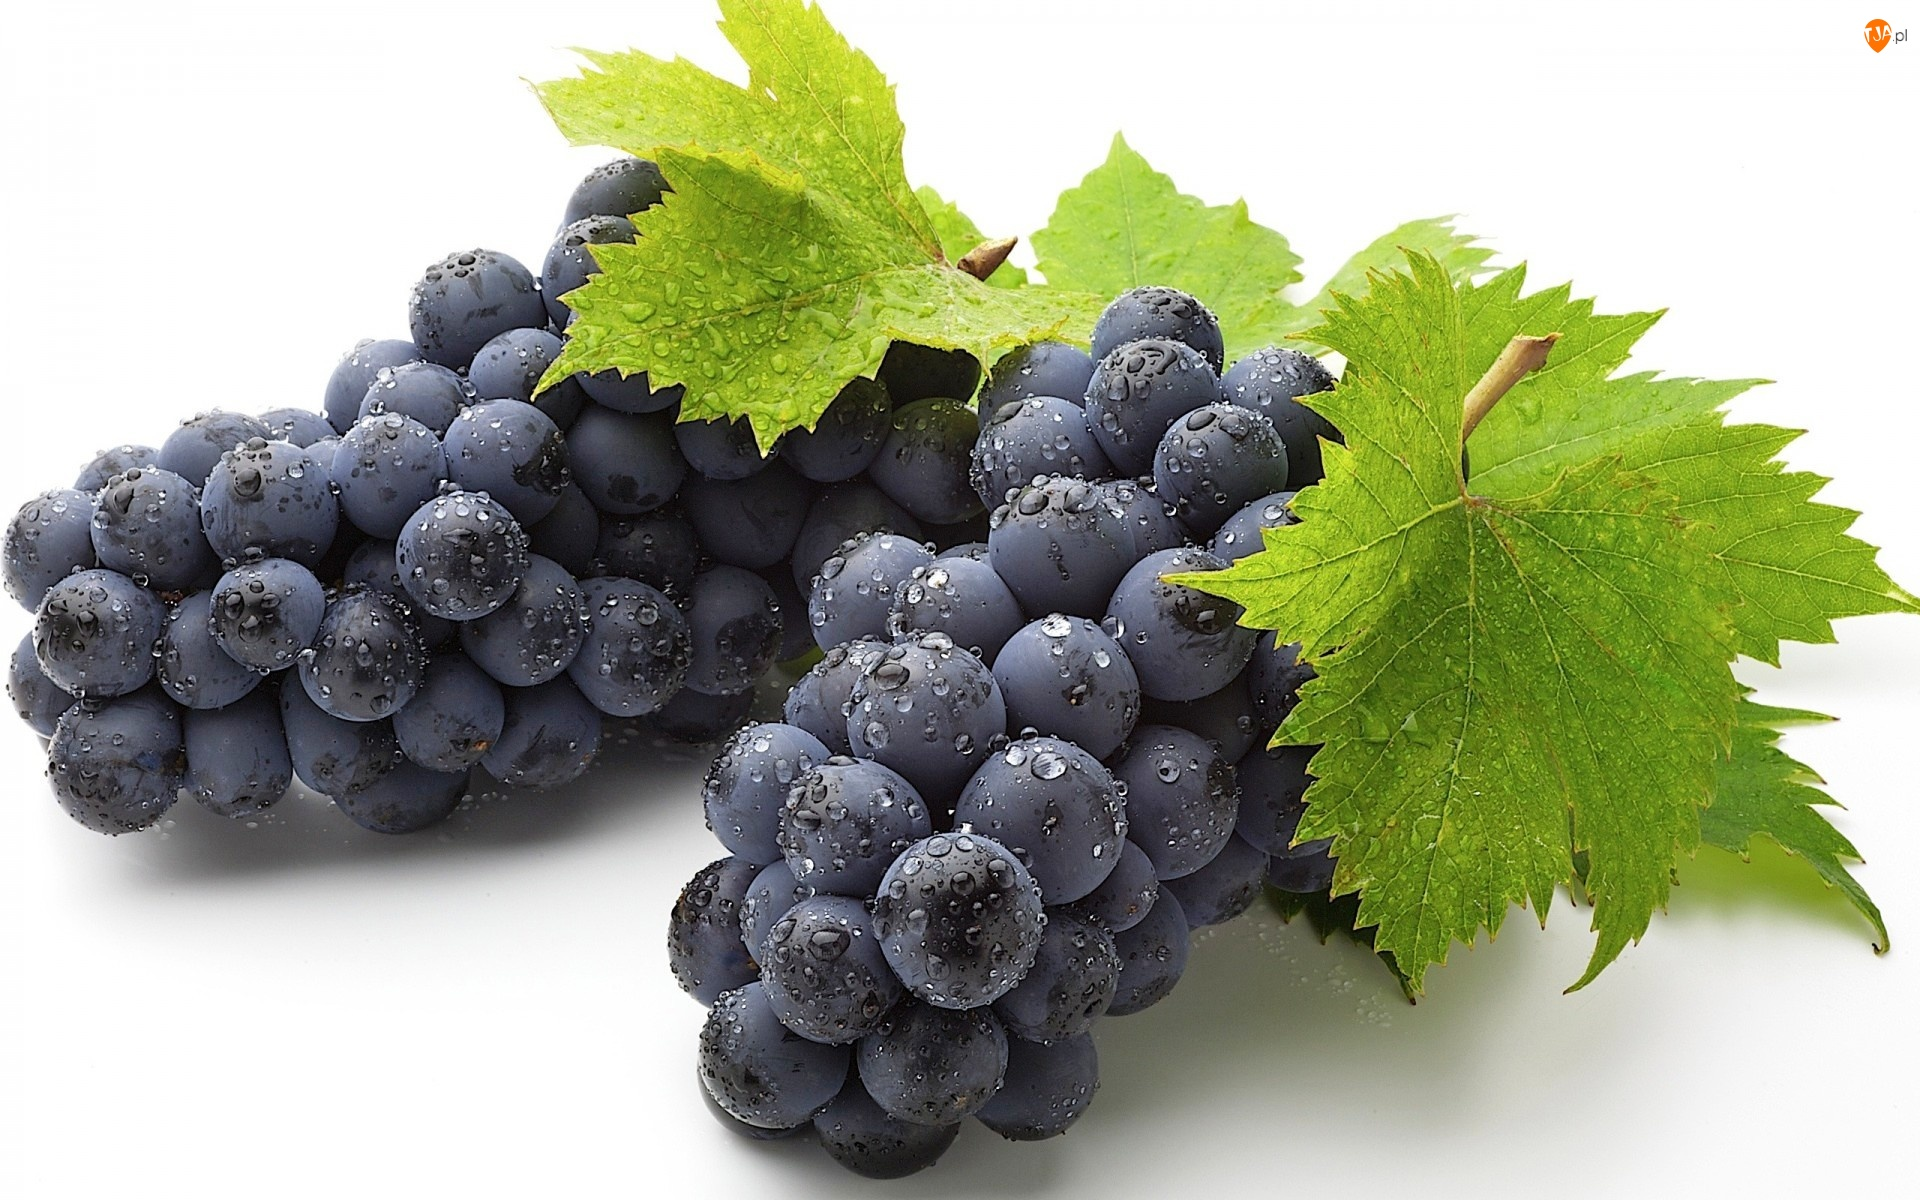 Winogrona, Wody, Listki, Krople